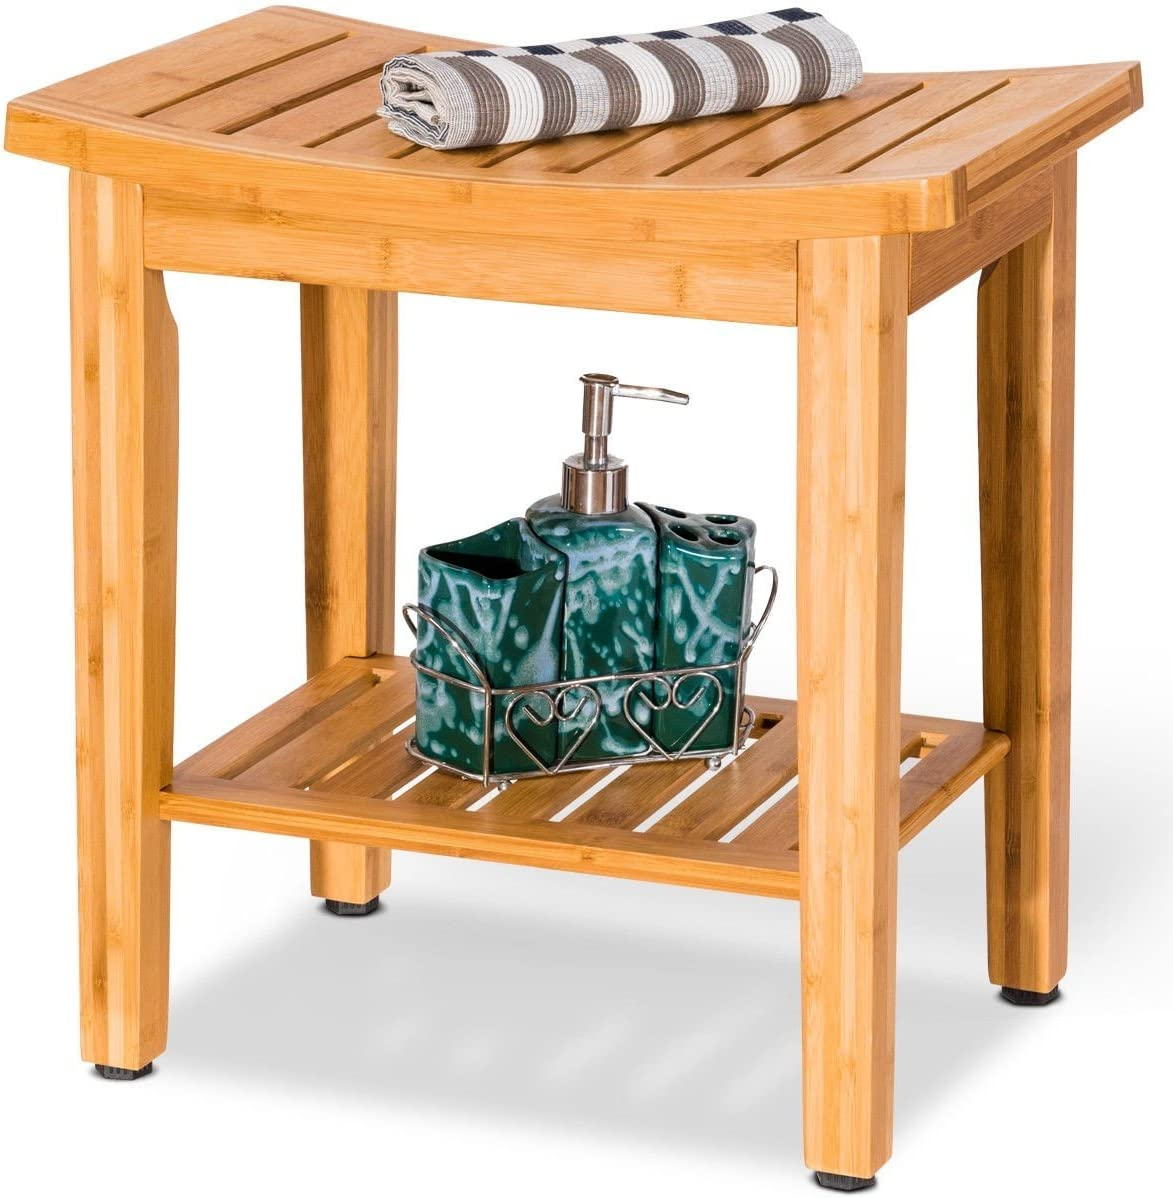 "18"" Bamboo Shower Seat Bench w/ Storage Shelf - By Choice Products 71cYR8D49LLSL1200_"